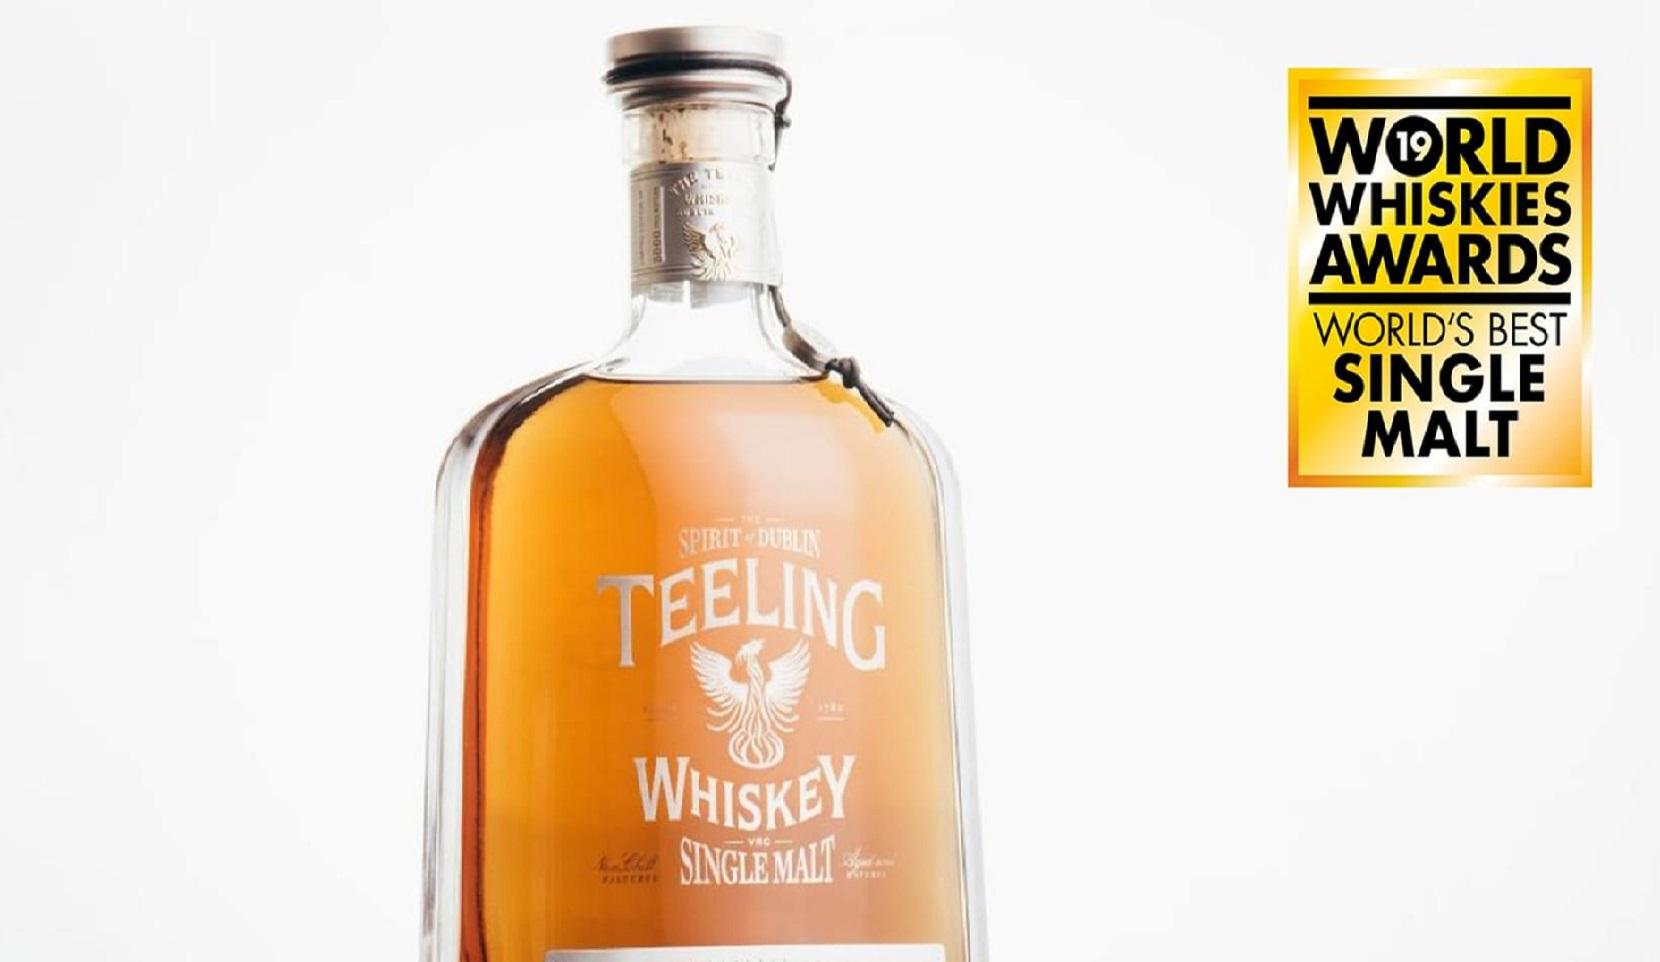 Teeling Whiskey 24 Year Old is the World's Best Single Malt